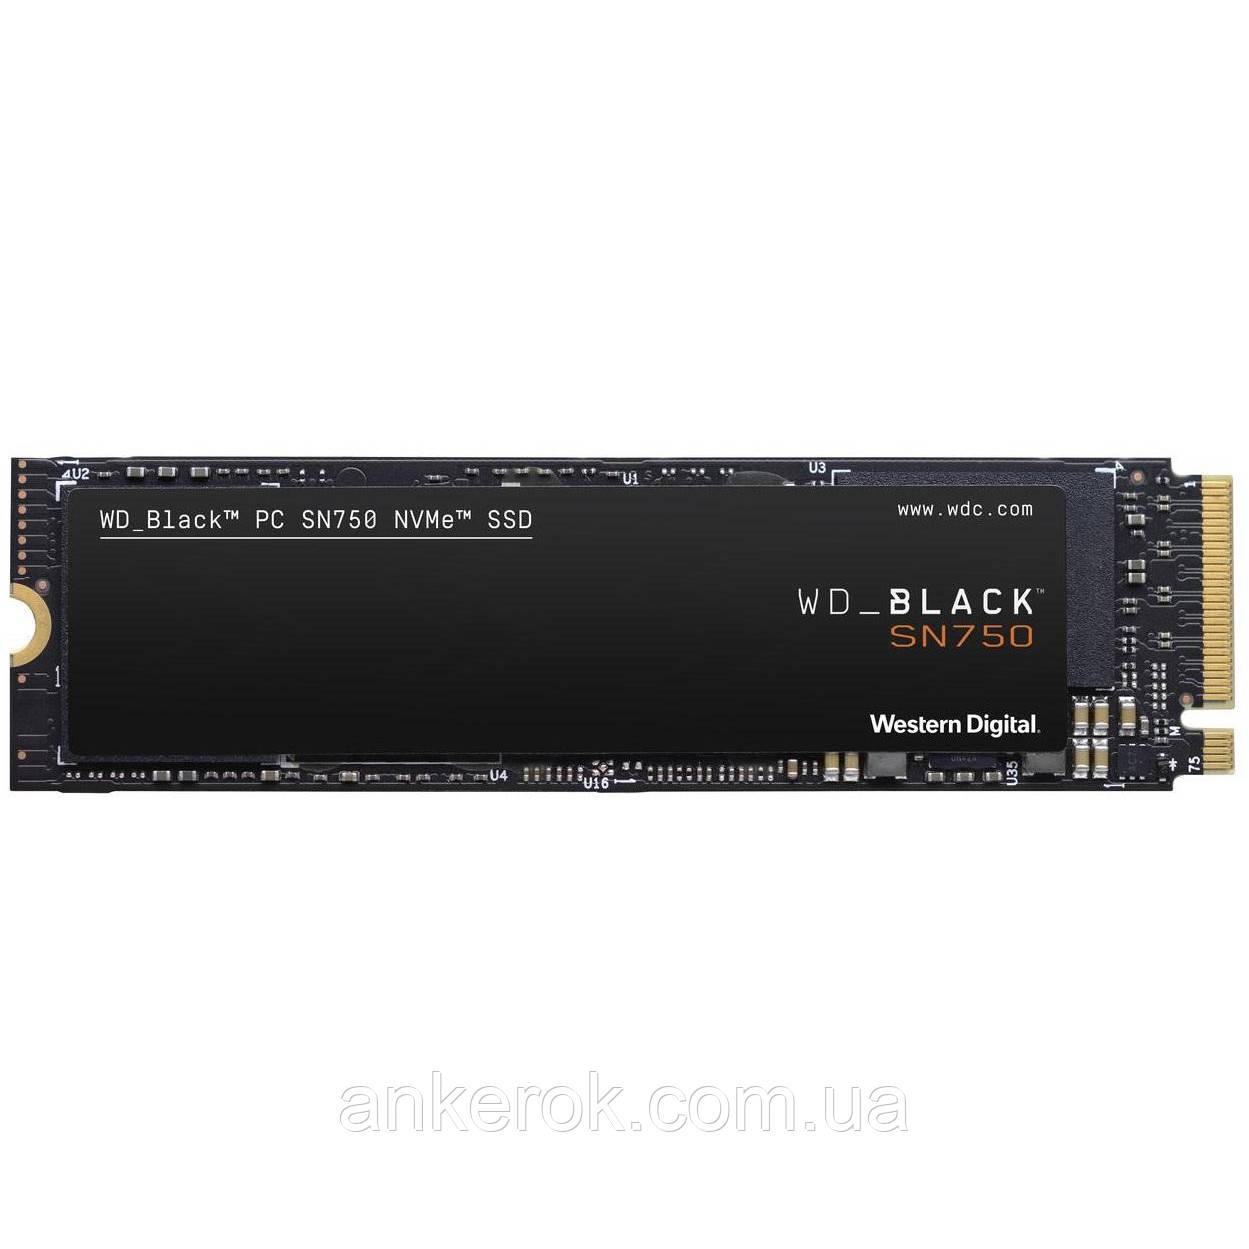 SSD накопичувач WD Black SN750 NVME SSD 500 GB (WDS500G3X0C)